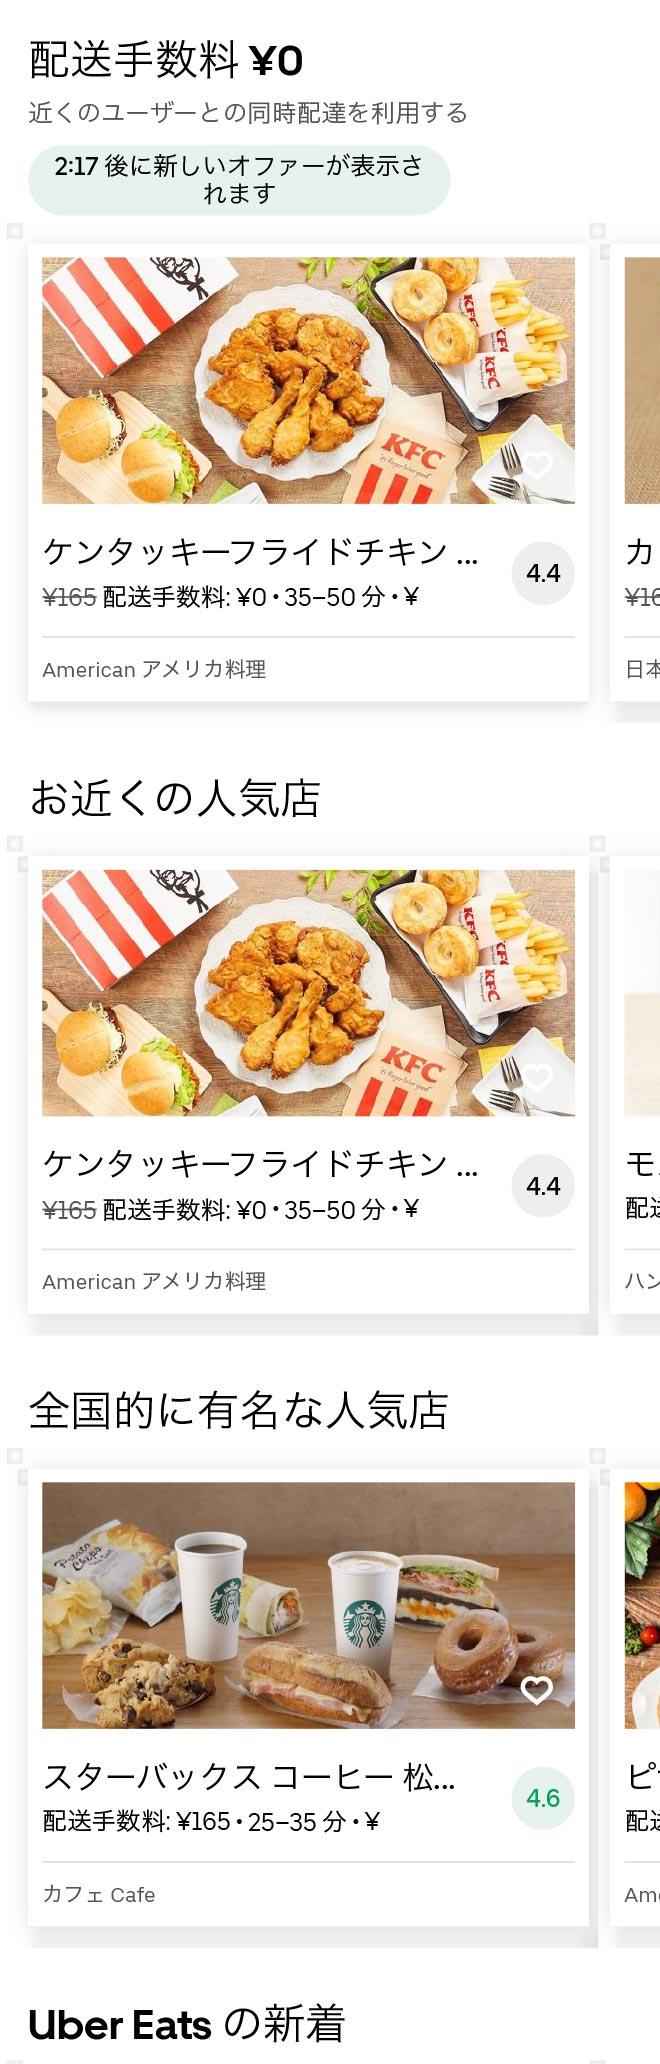 Nagao menu 2010 01